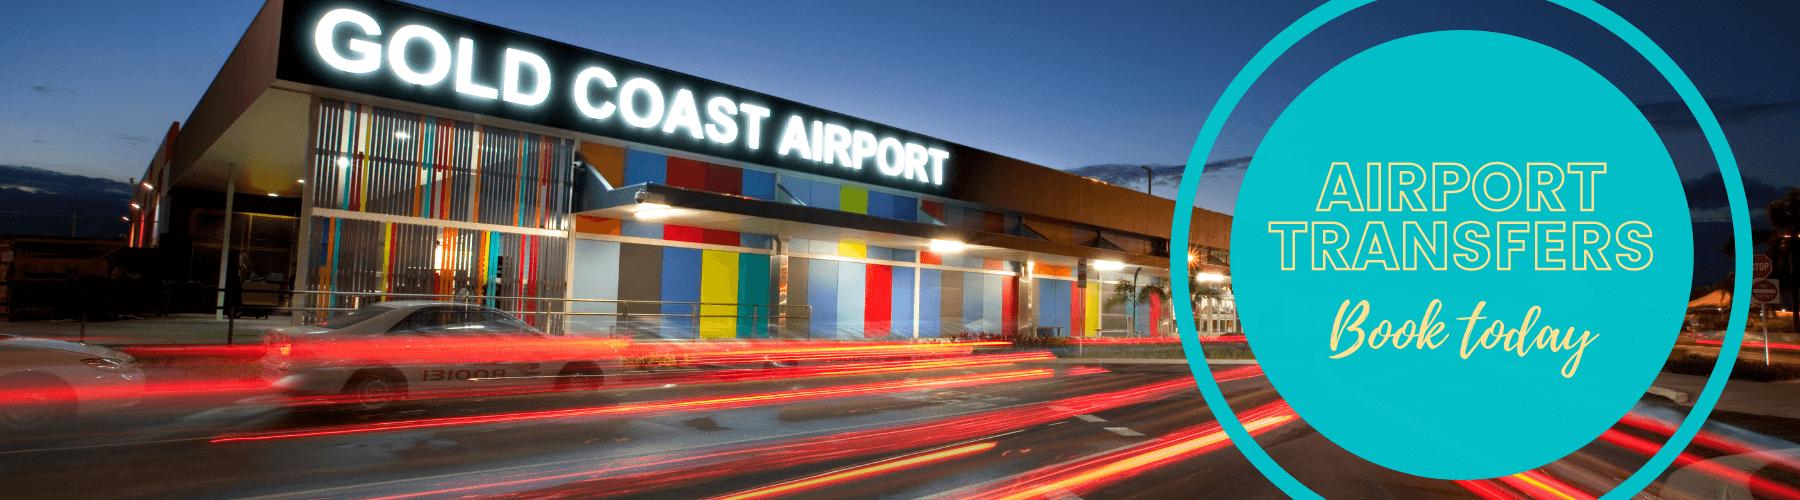 AirportTransfers_1800x500